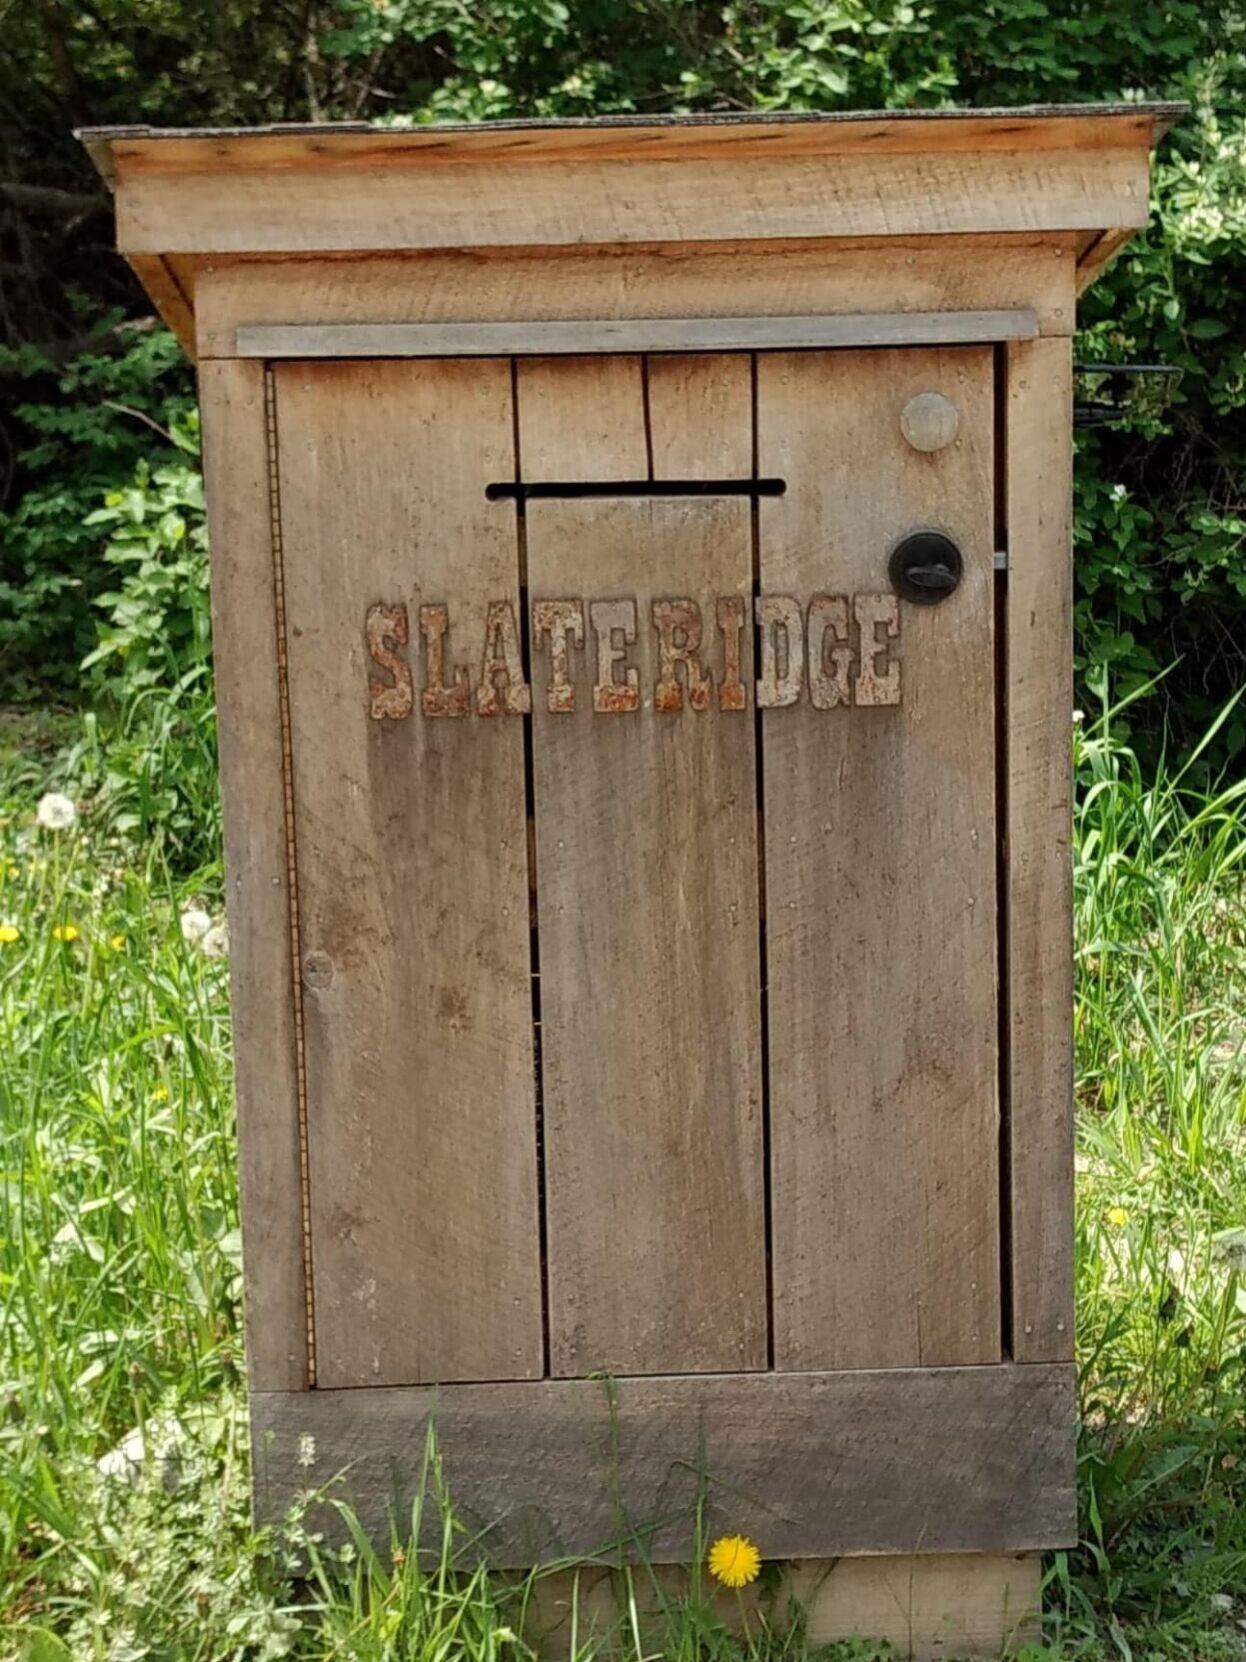 Slate Ridge mail box